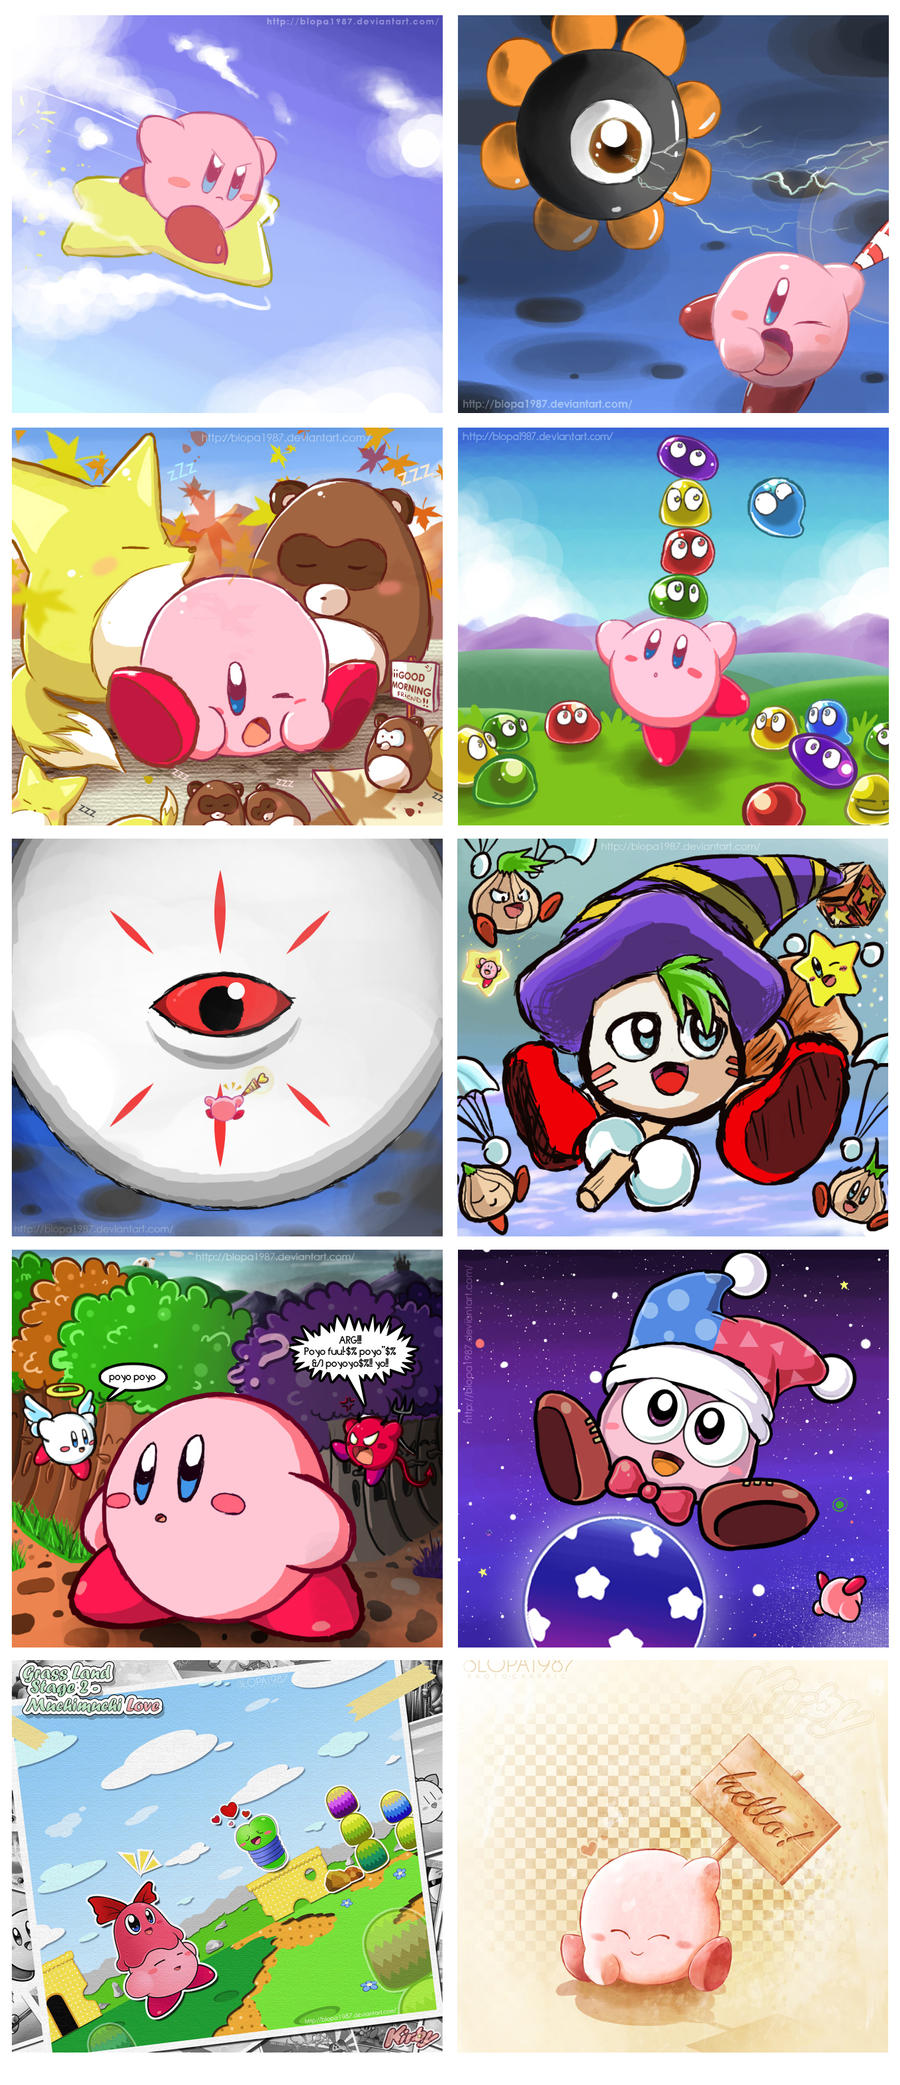 Random Kirby by Blopa1987